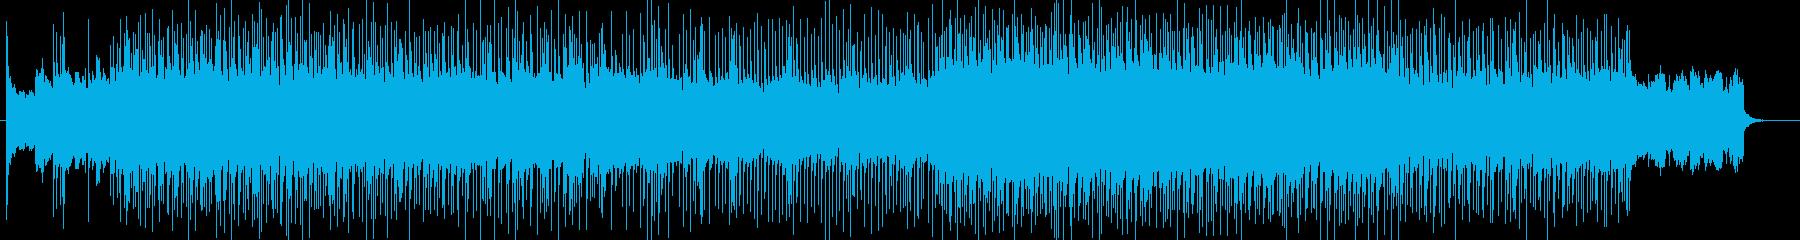 「HR/HM」「DARK」BGM303の再生済みの波形